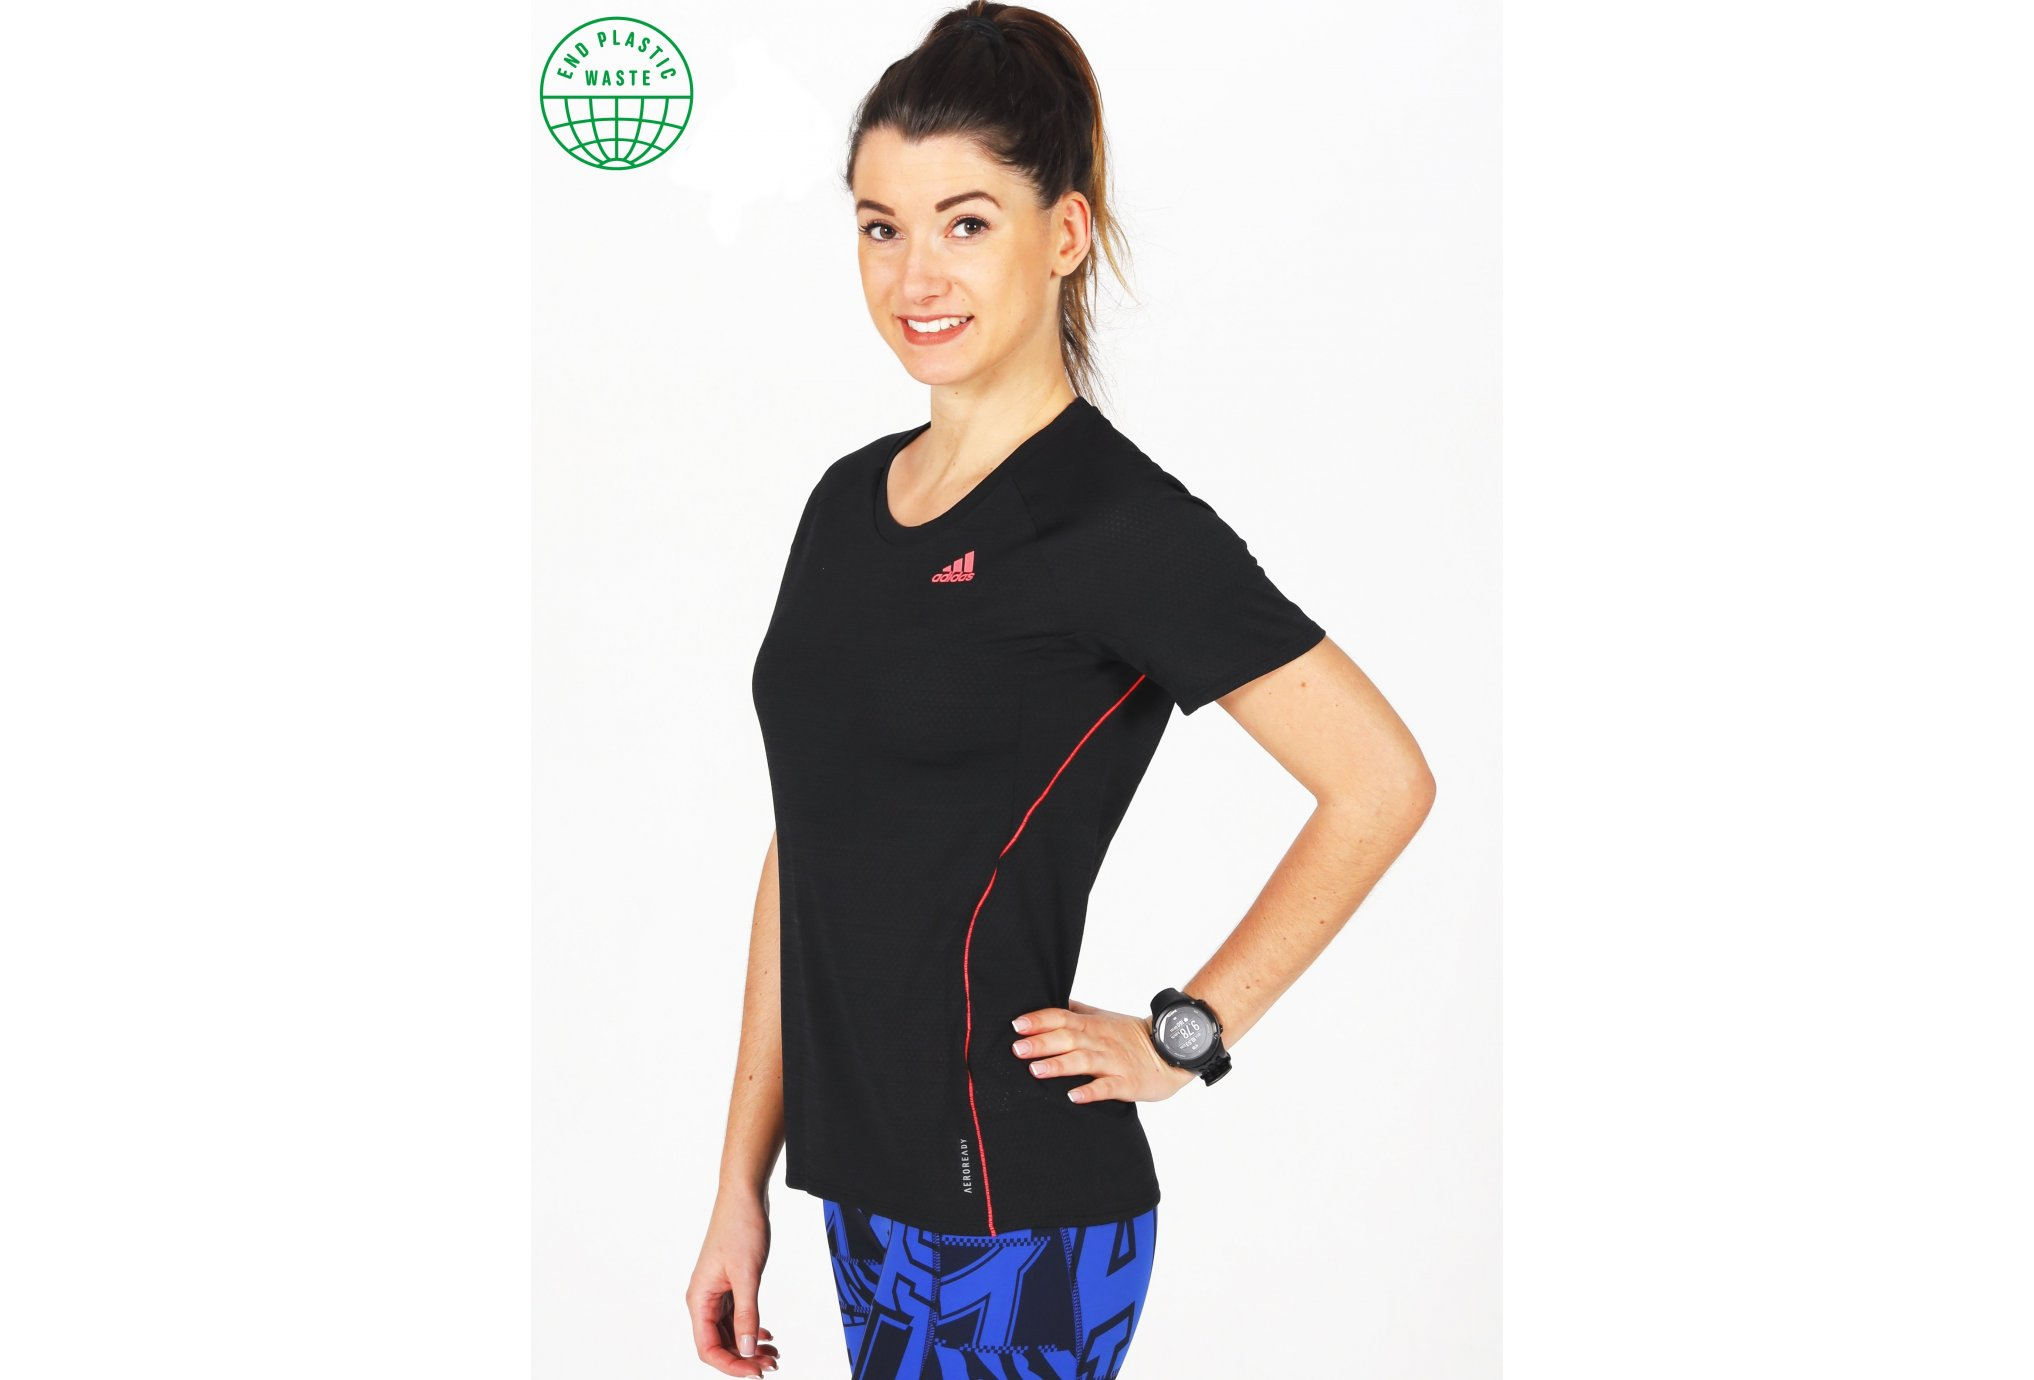 adidas Adi Runner Primegreen W Diététique Vêtements femme